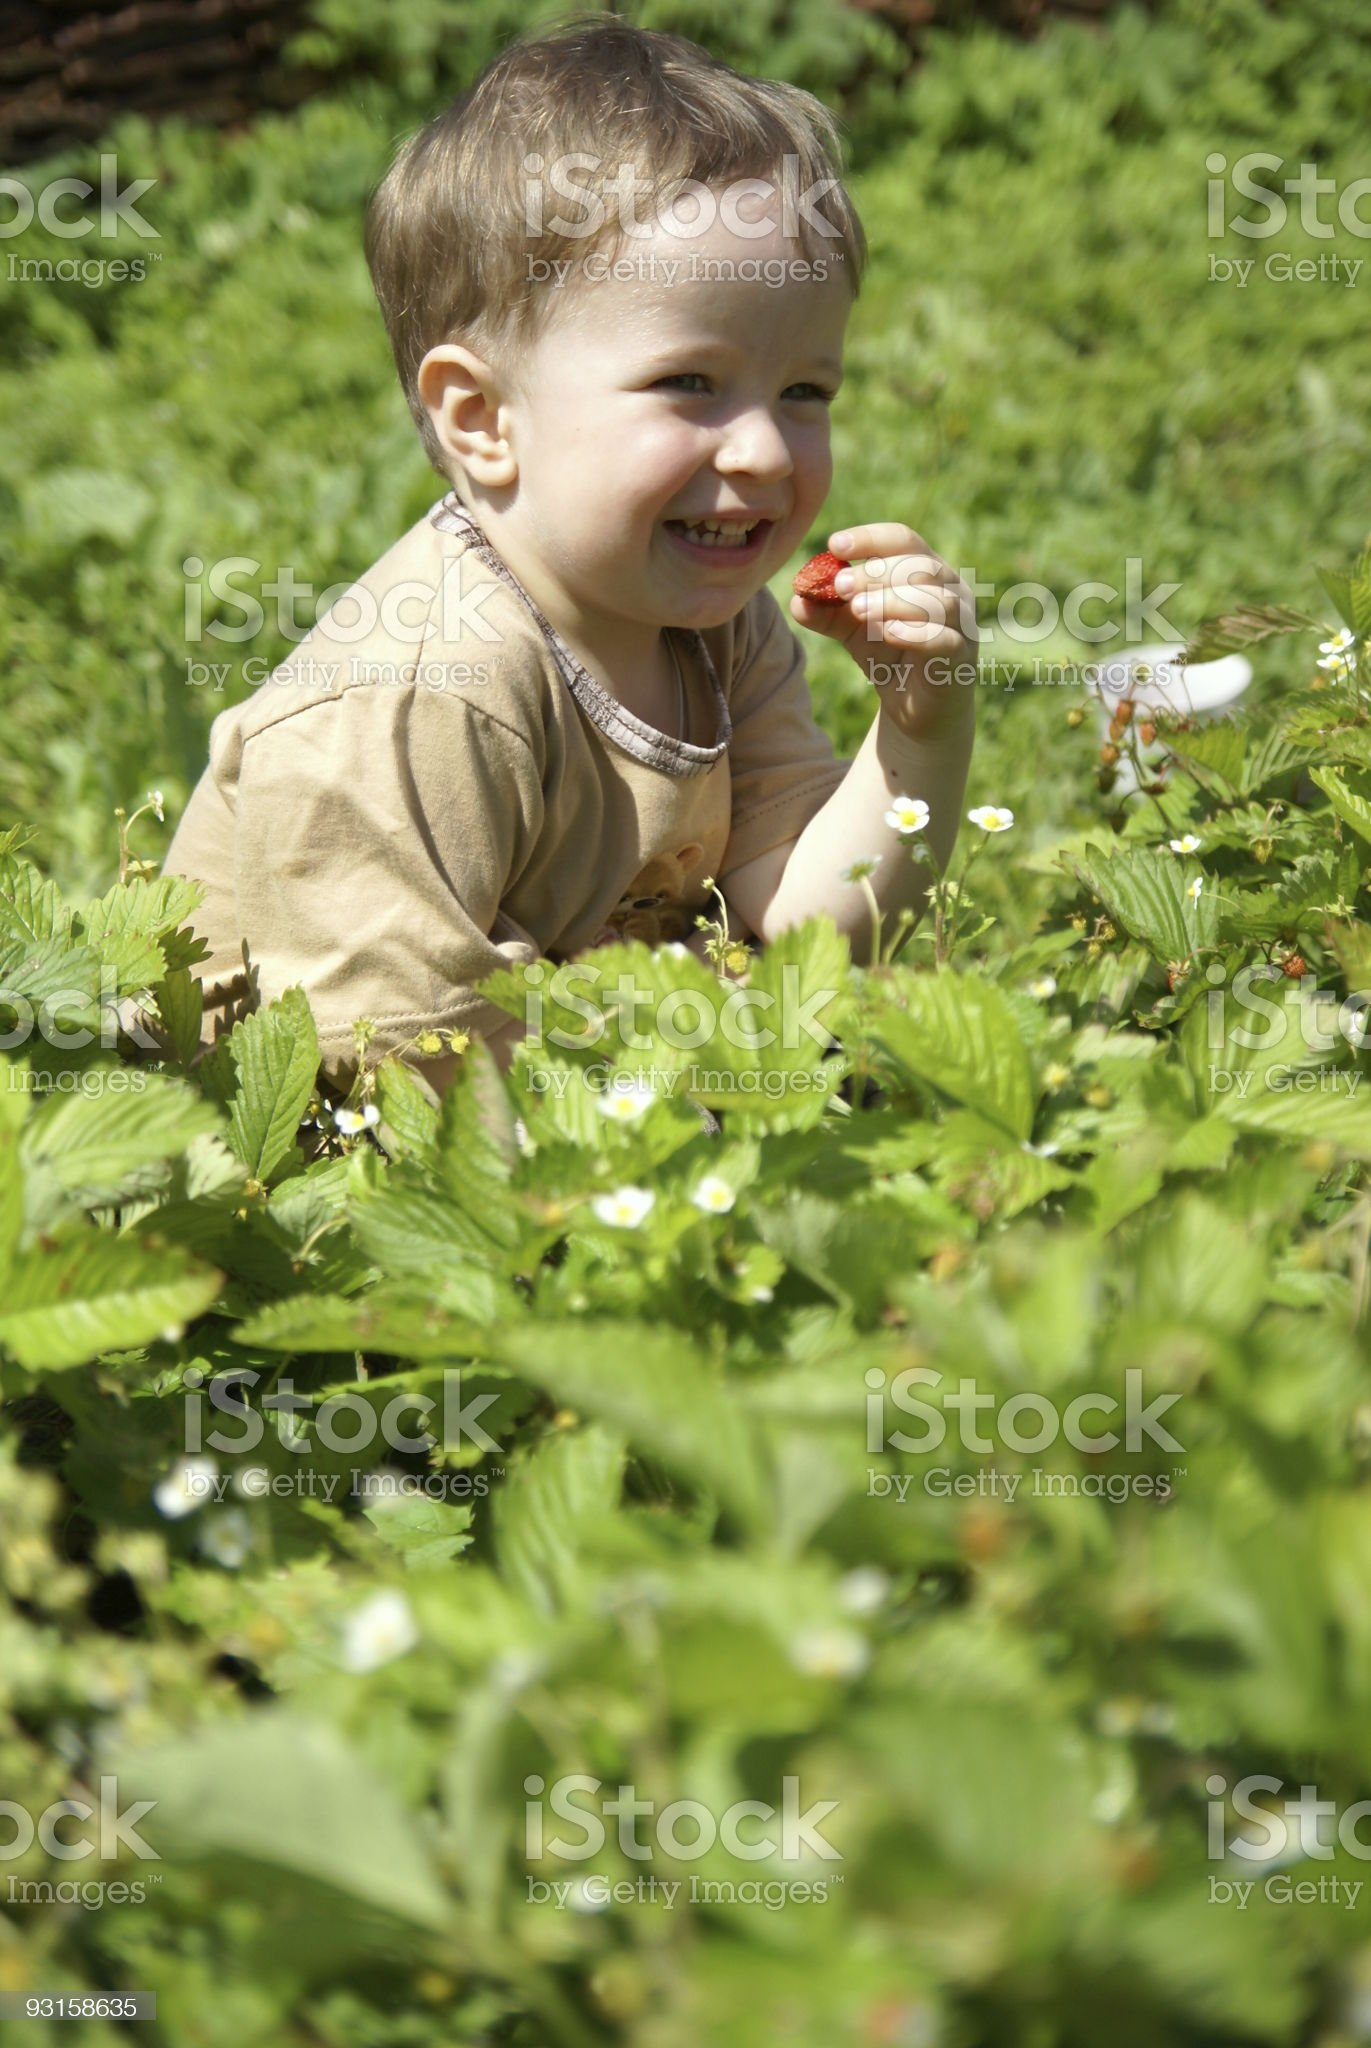 Boy eats strawberries royalty-free stock photo